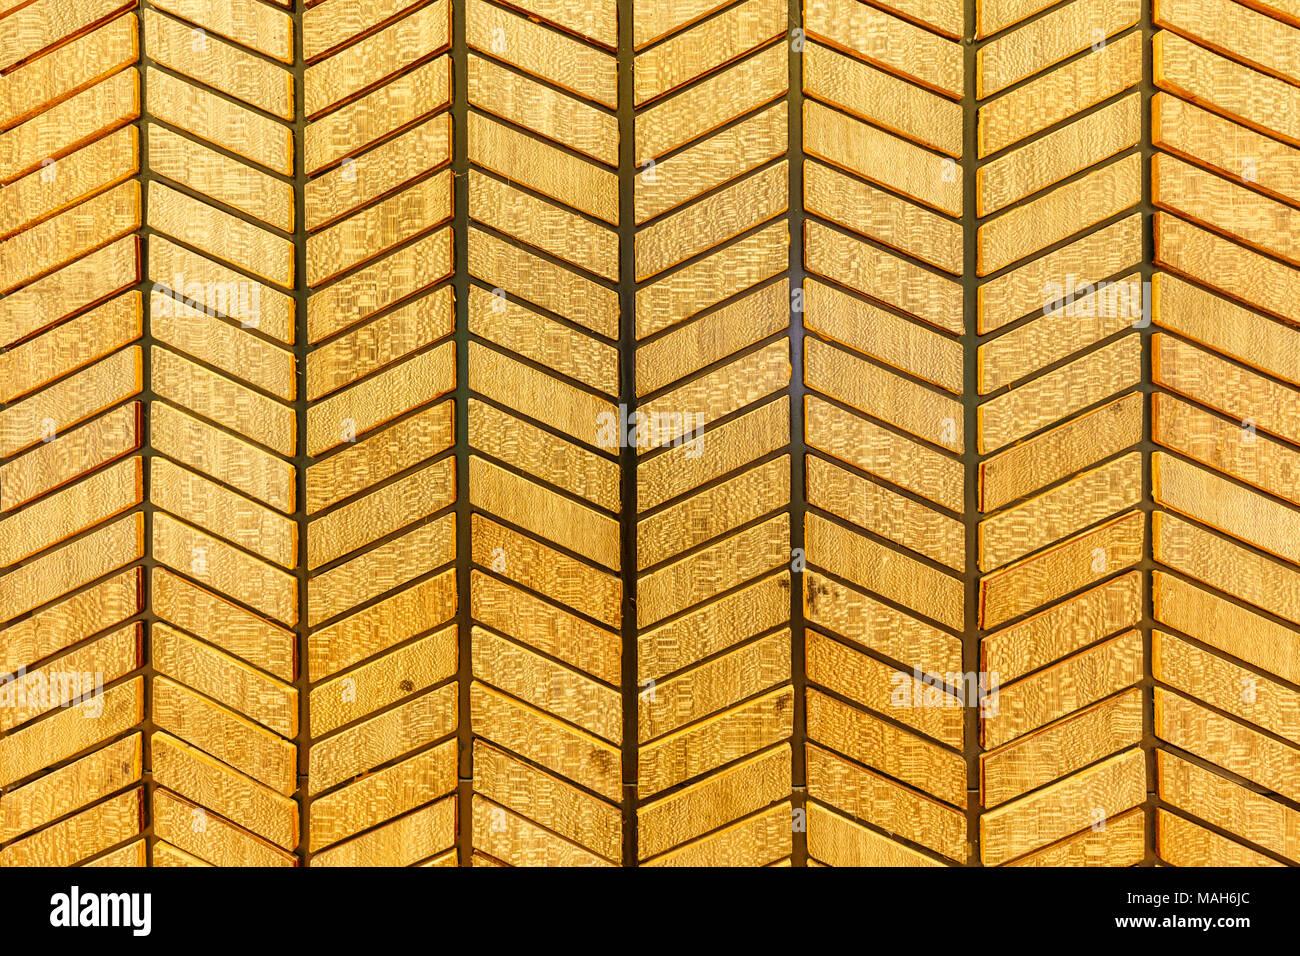 holz wand hintergrund textur stockfoto, bild: 178628644 - alamy